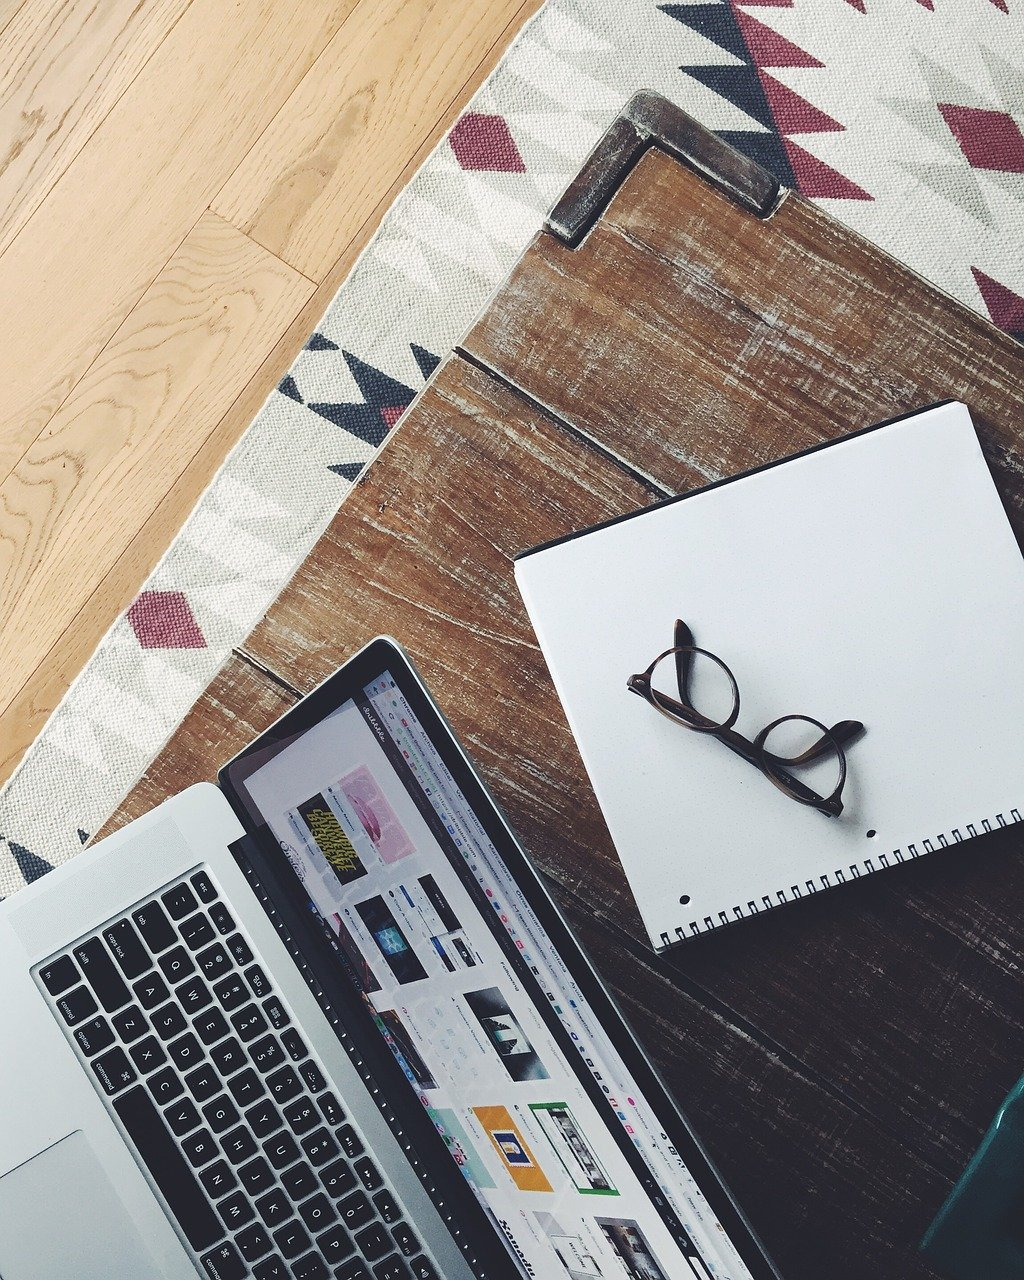 apple, eyeglasses, laptop